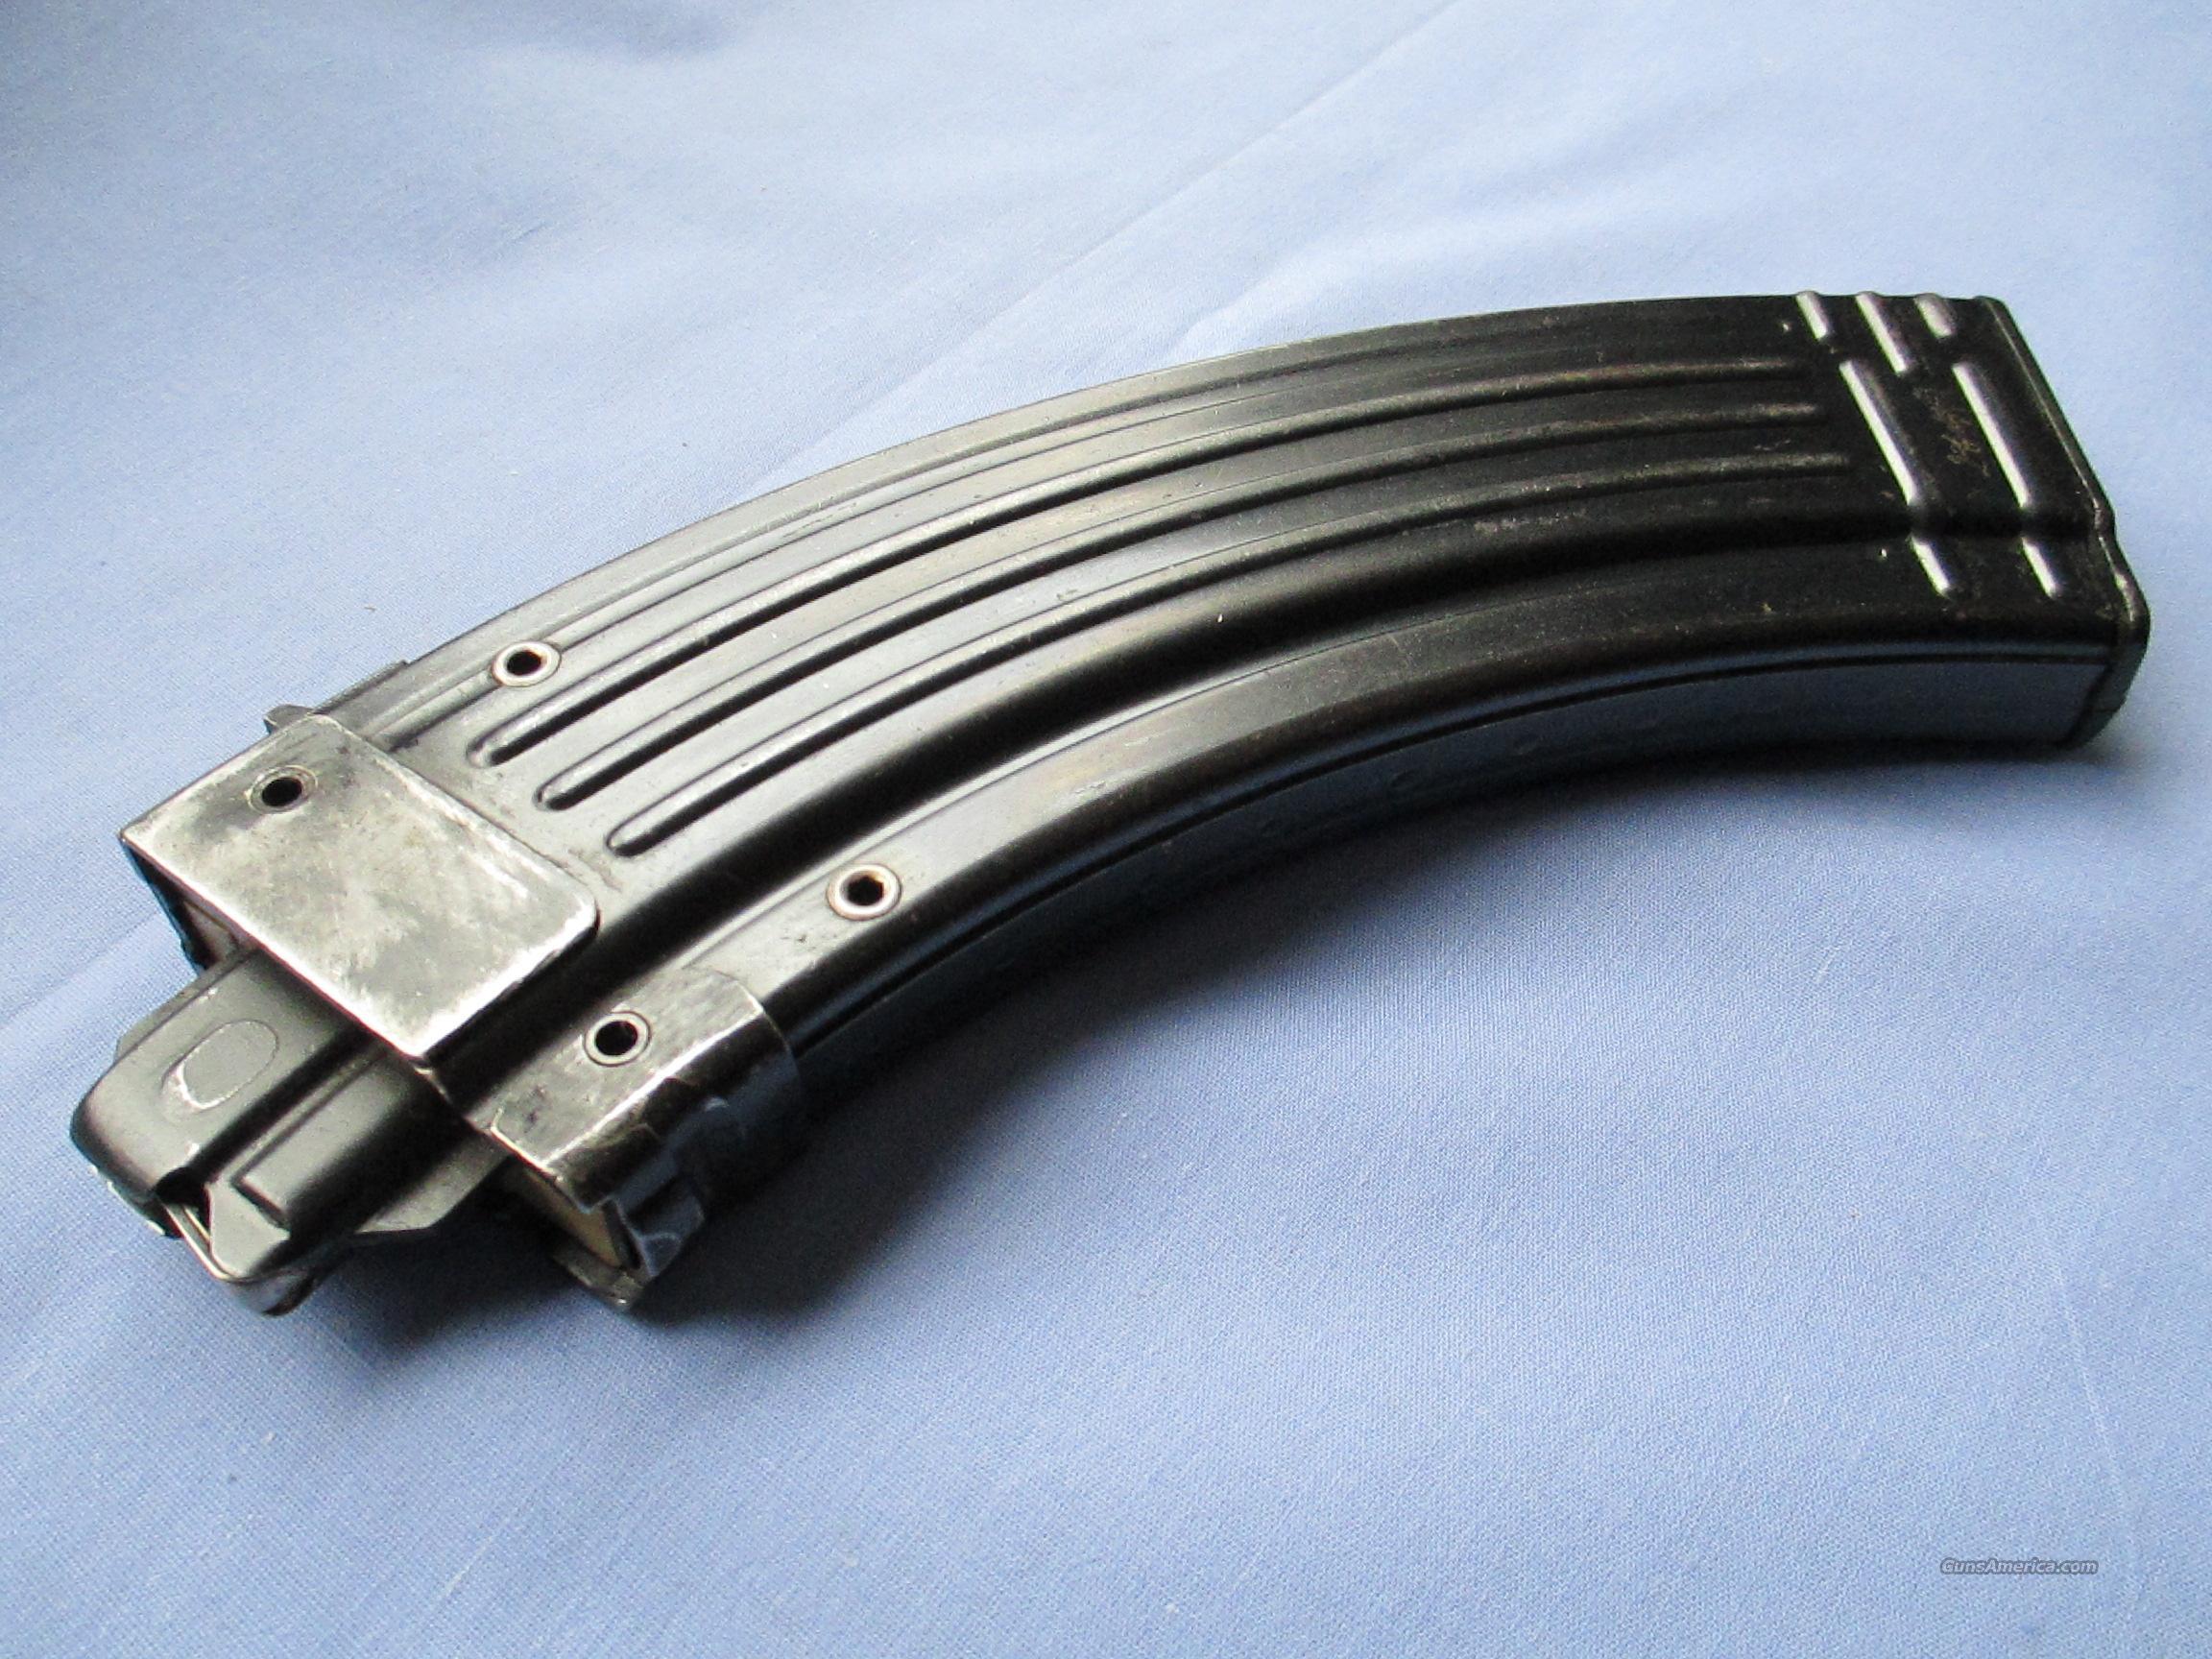 AK- EAST GERMAN AK   .22 TRAINER MAG.  Non-Guns > Magazines & Clips > Rifle Magazines > AK Family